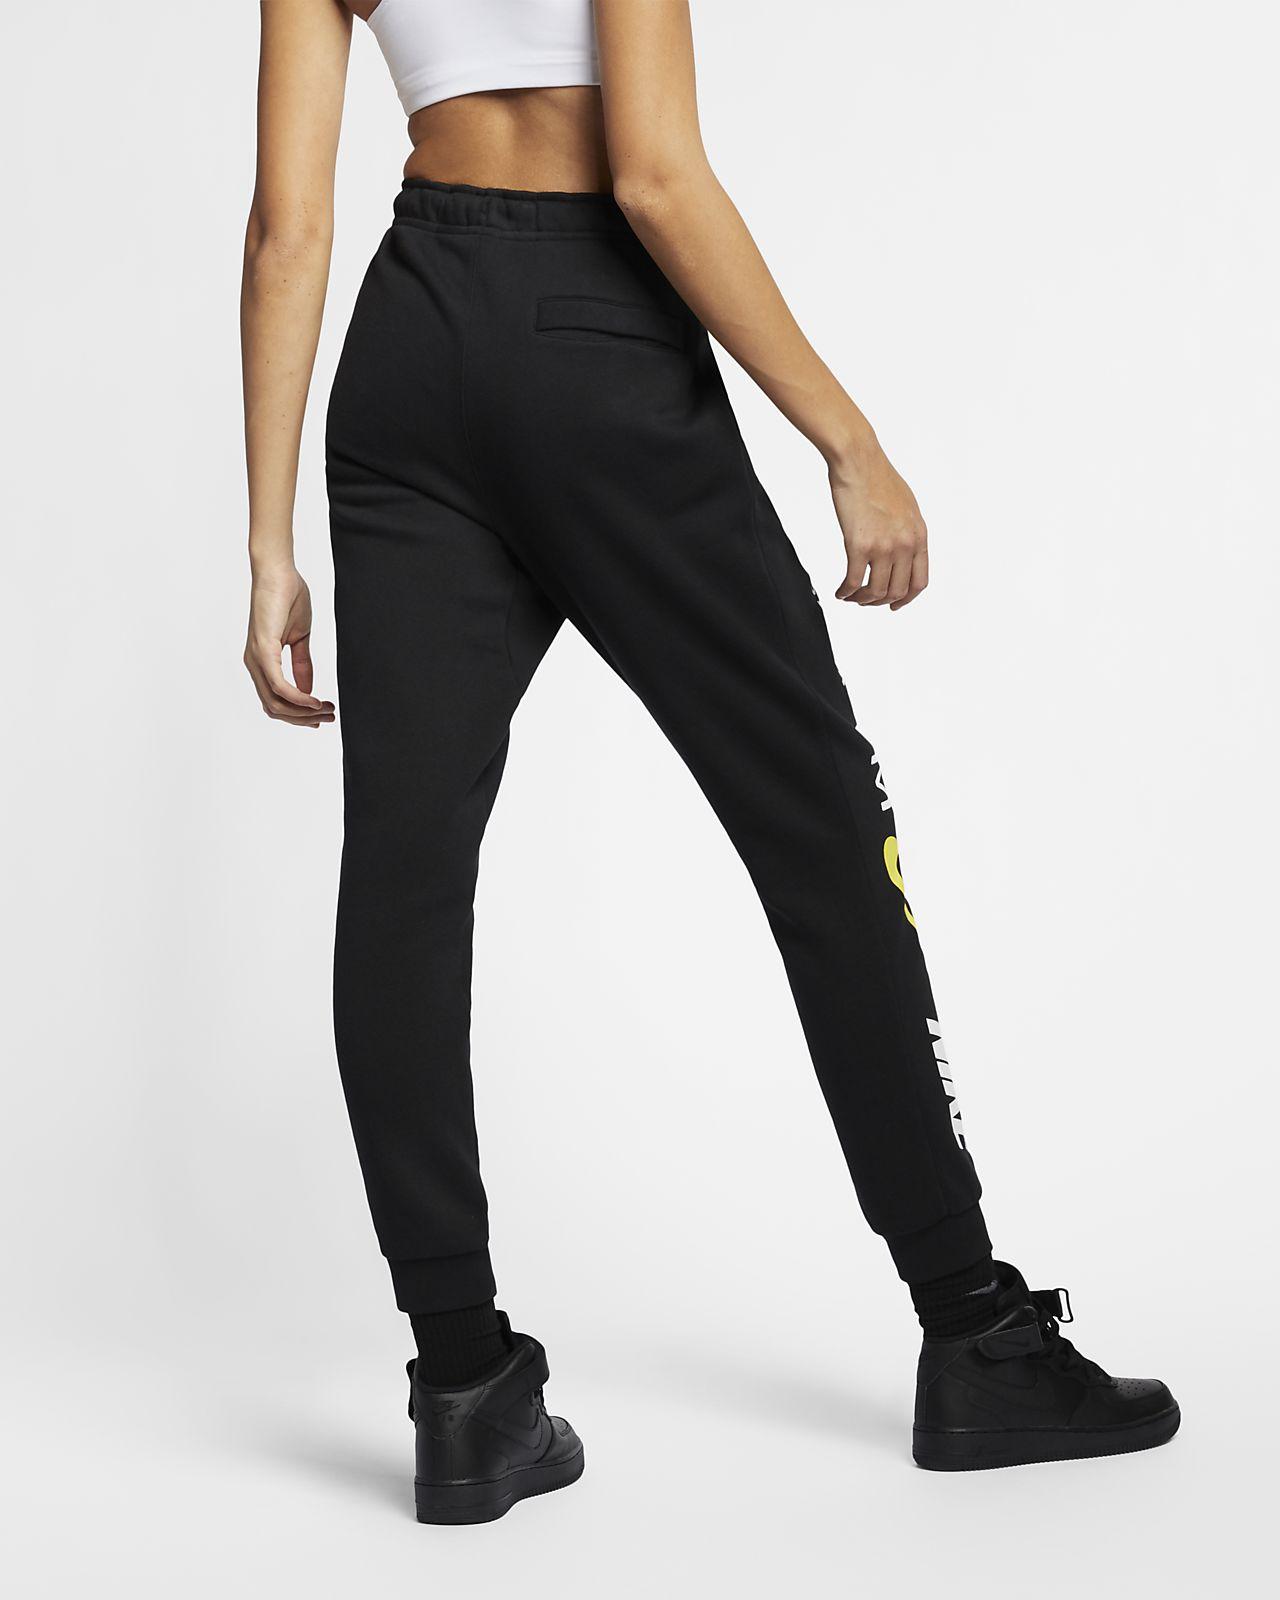 b18c15c42a Pantalon de jogging Nike Sportswear Club. Nike.com FR